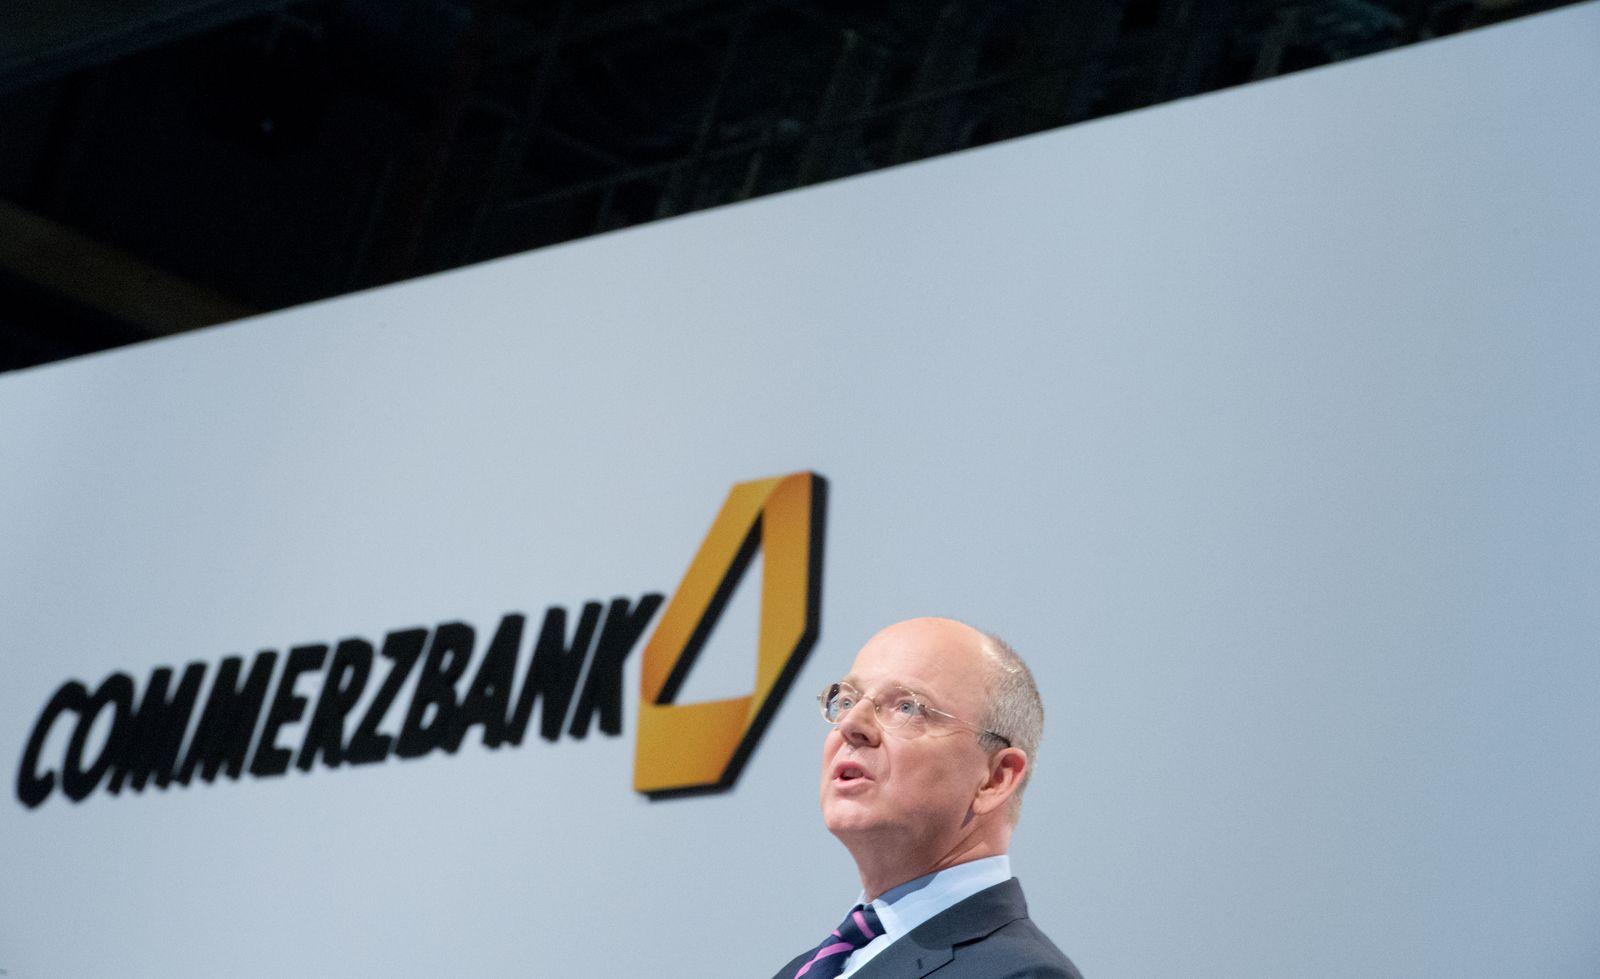 Commerzbank - Martin Blessing